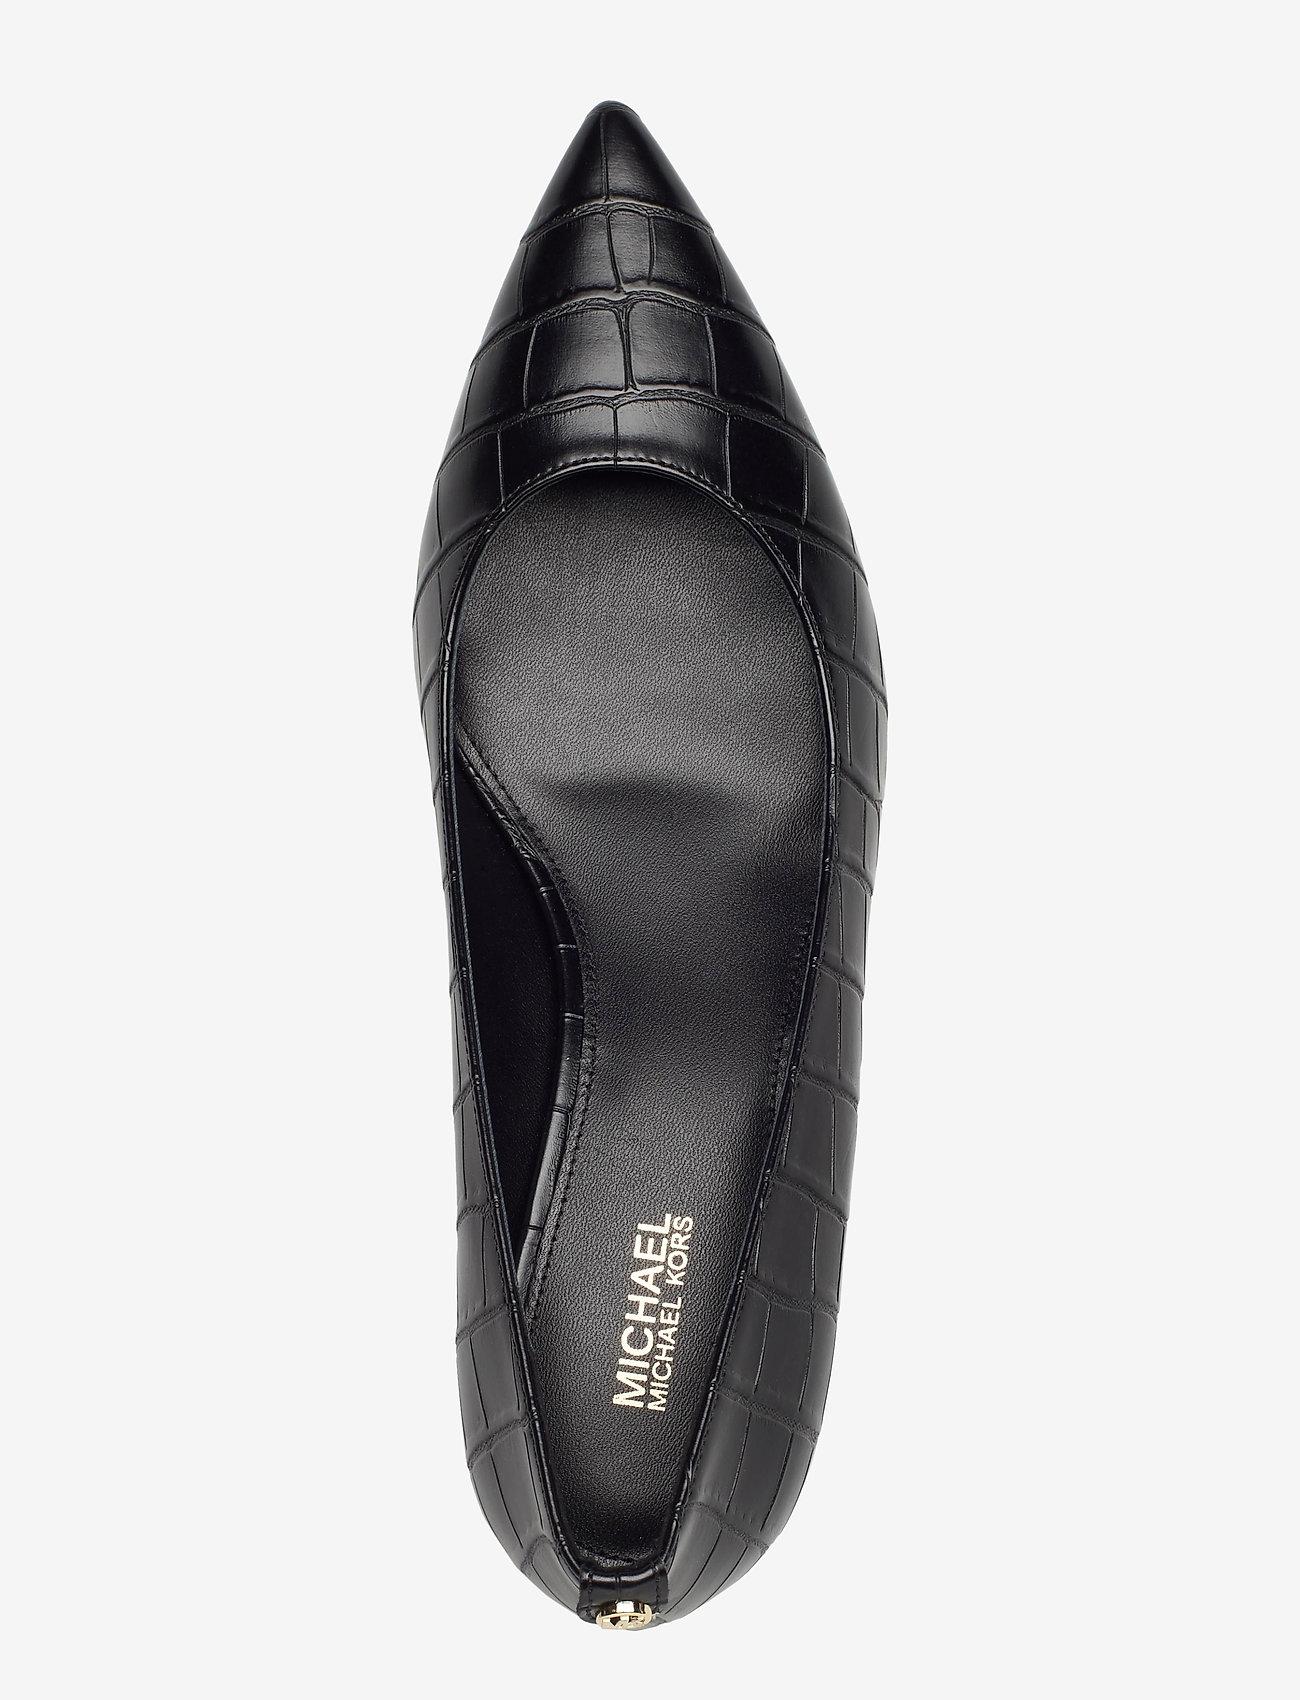 Sara Flex Kitten Pump (Black) (130 €) - Michael Kors Shoes 68LqF